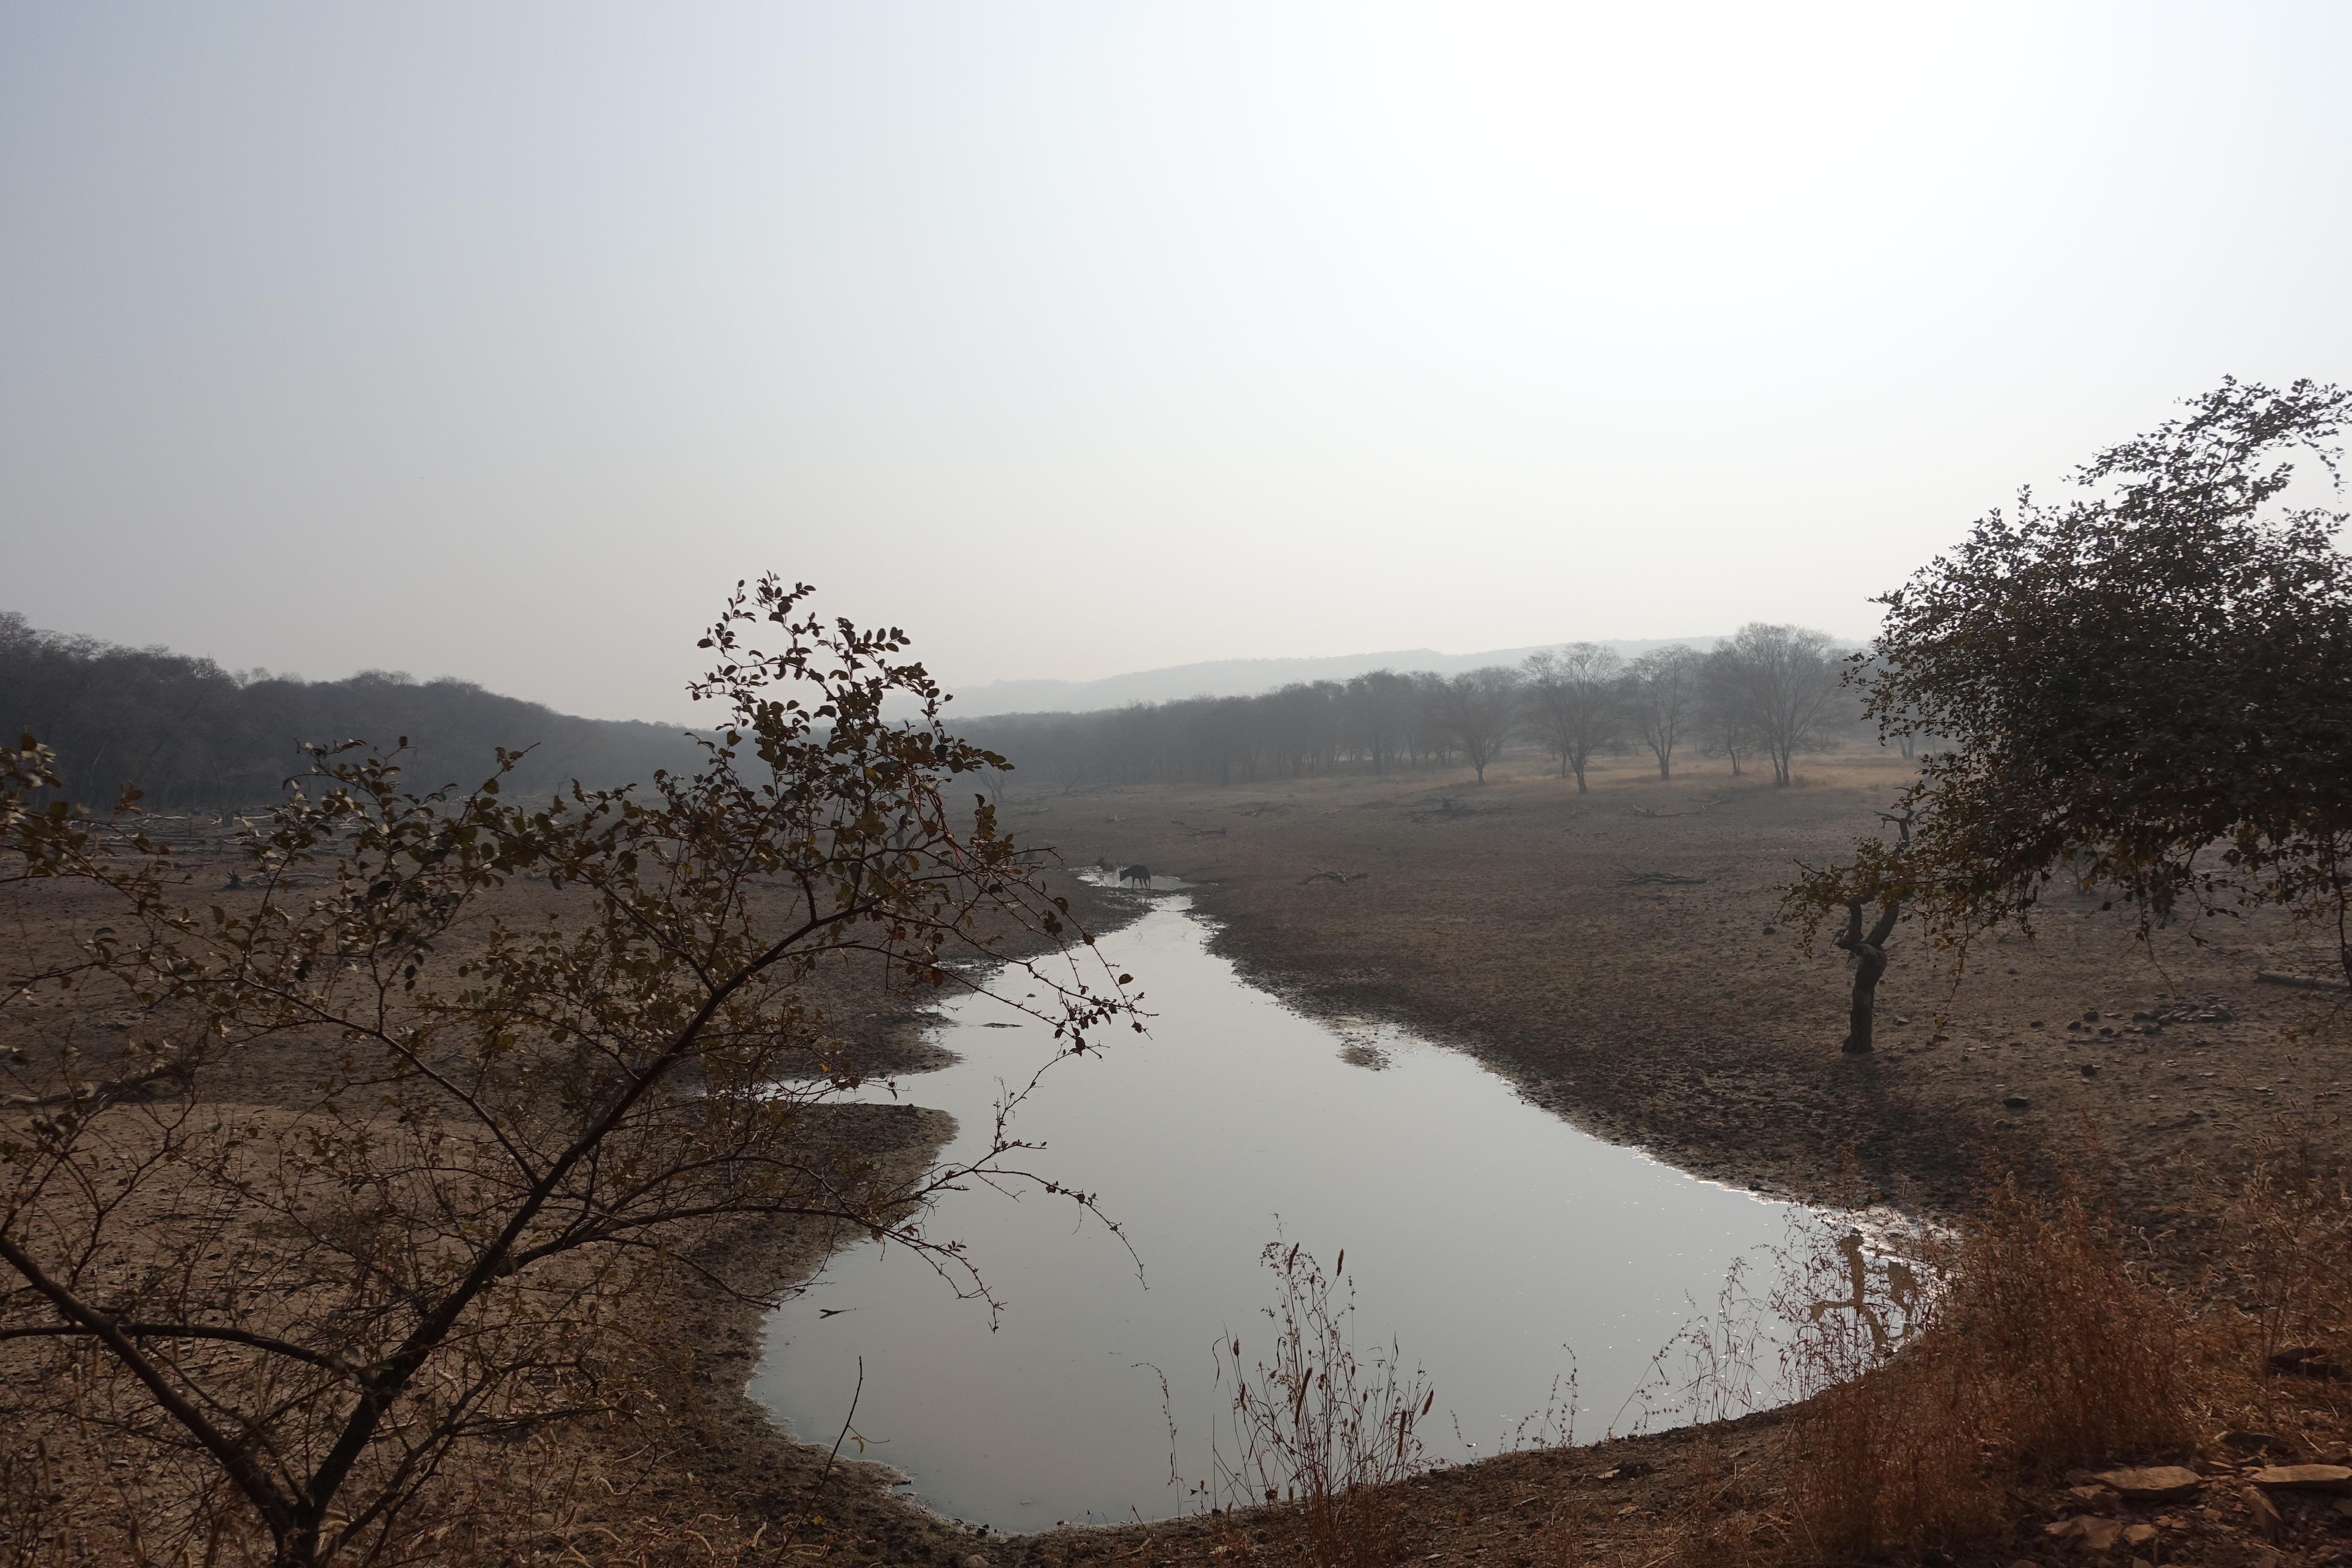 Ranthambhore National Park - photo by Juliamaud